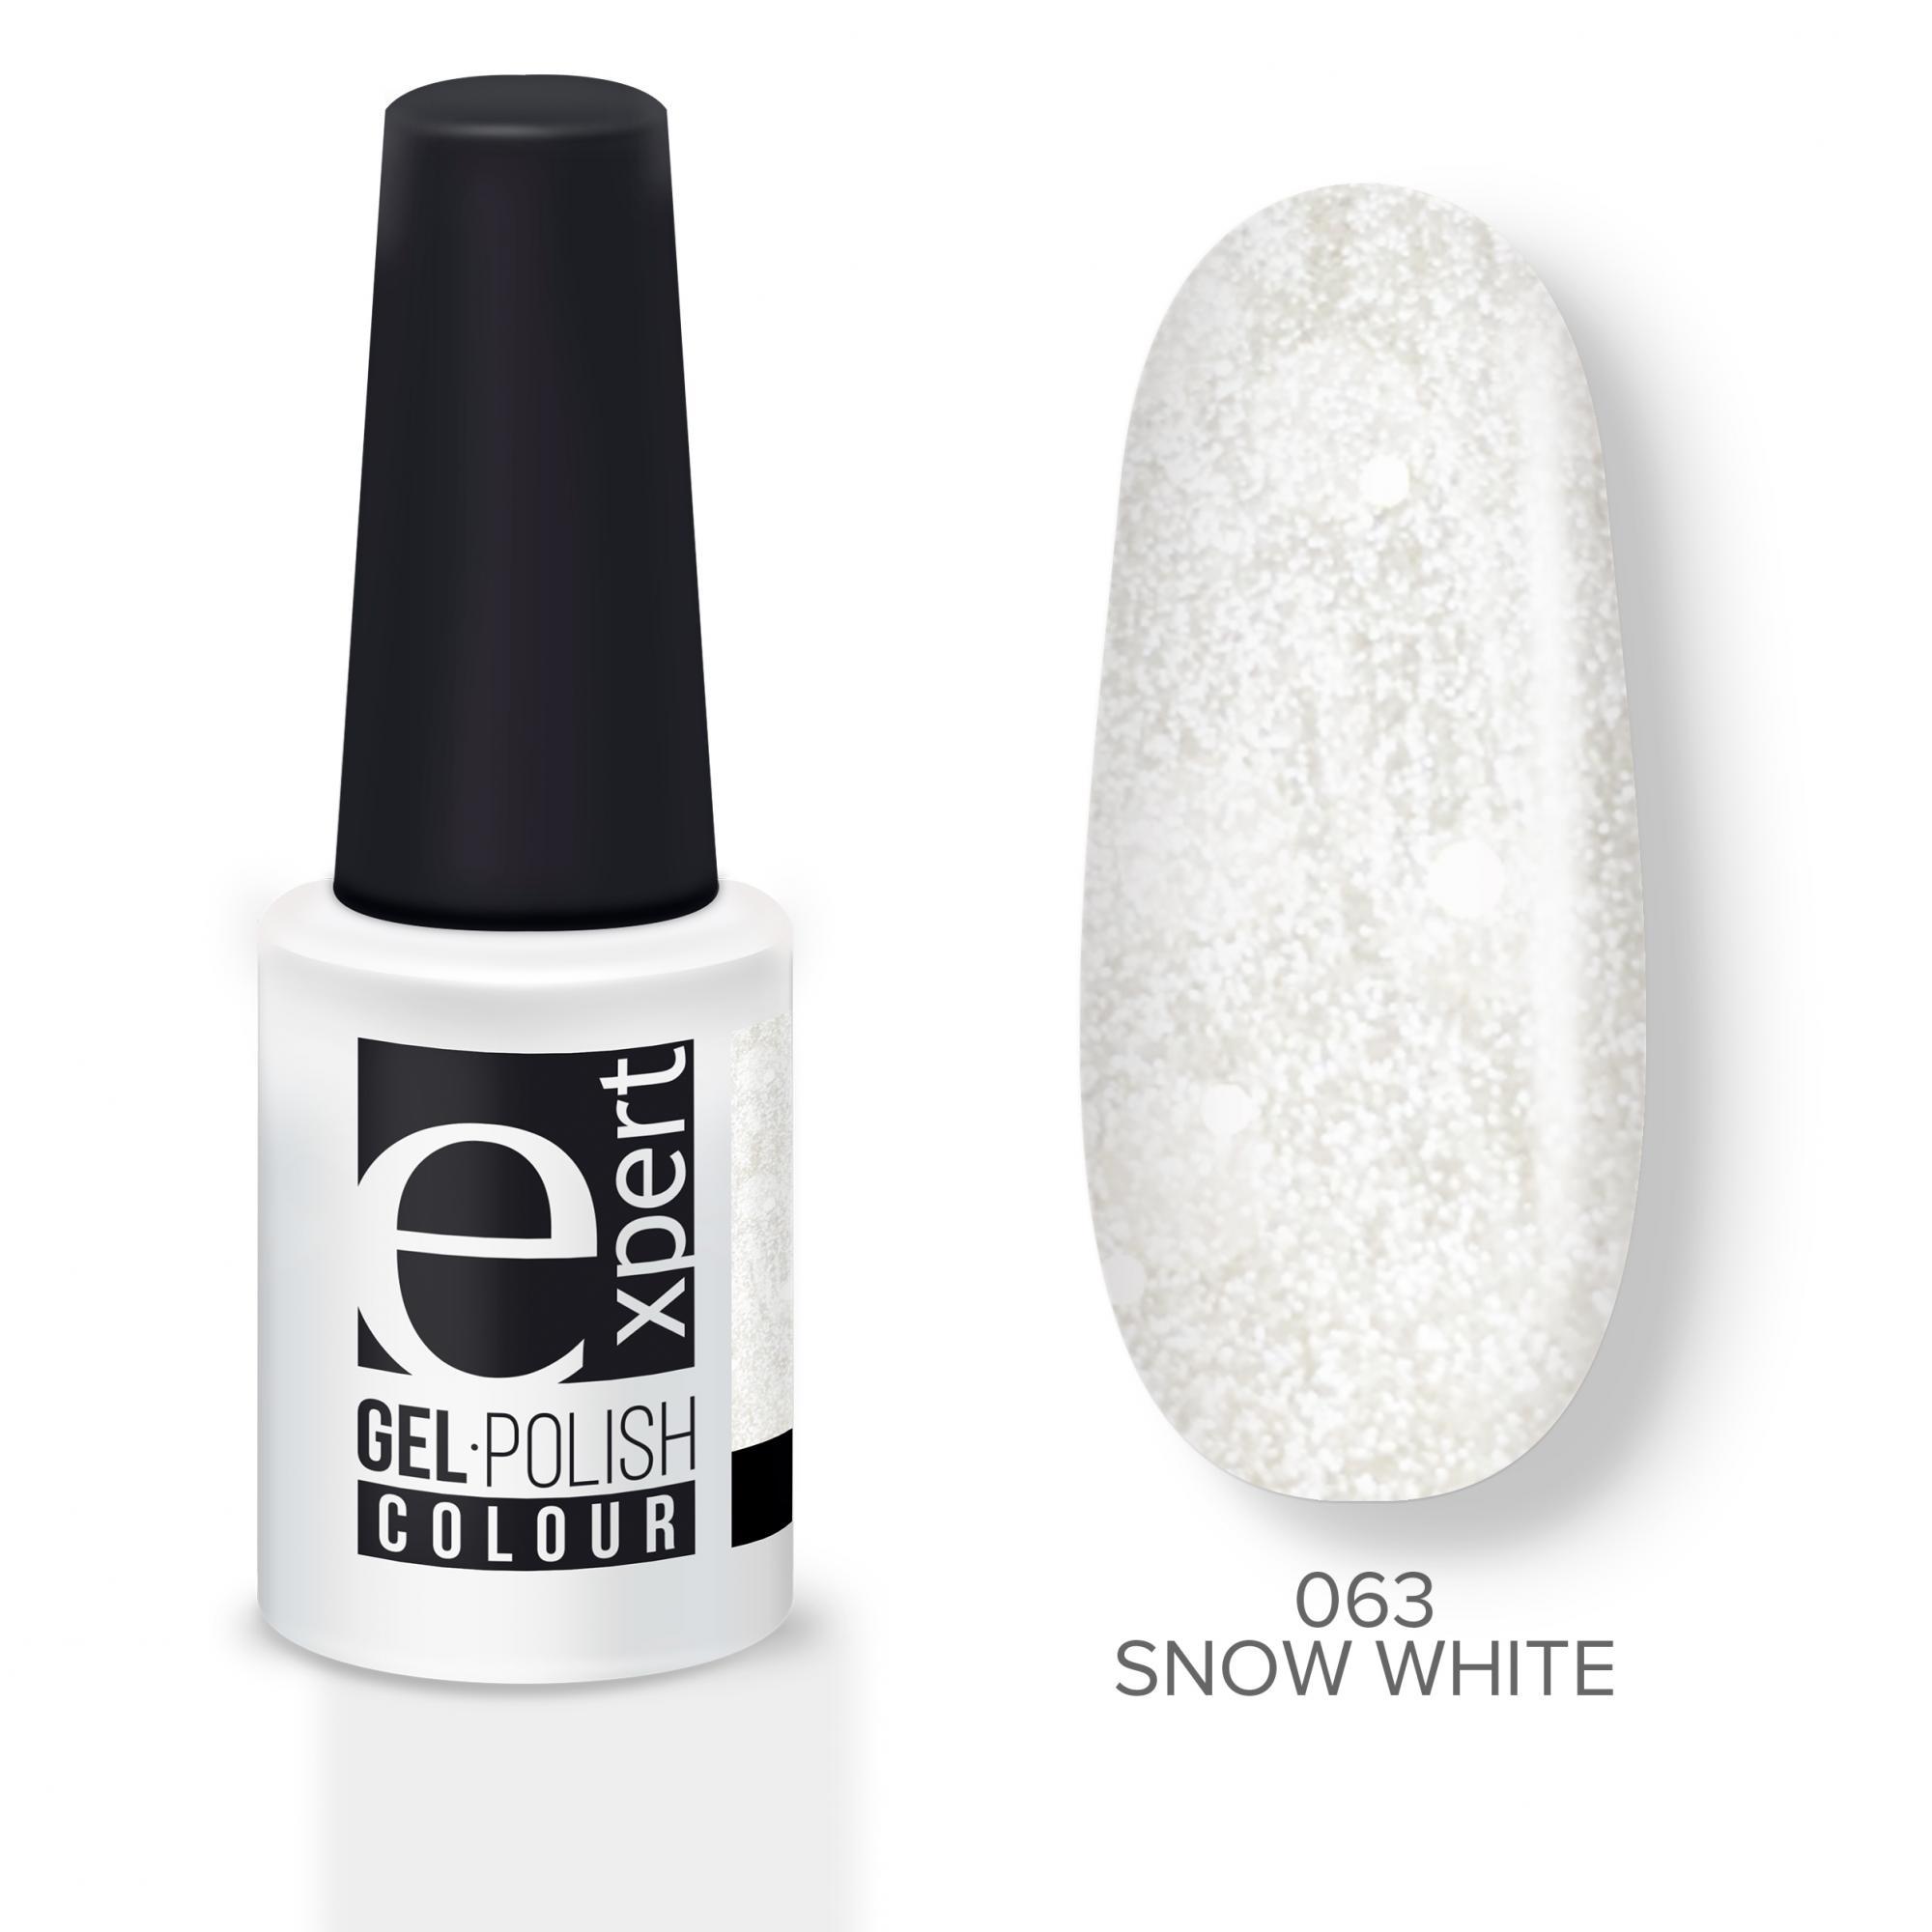 Купить Гель-лак Expert белый глиммер Snow White 063 EXPERT, 5мл